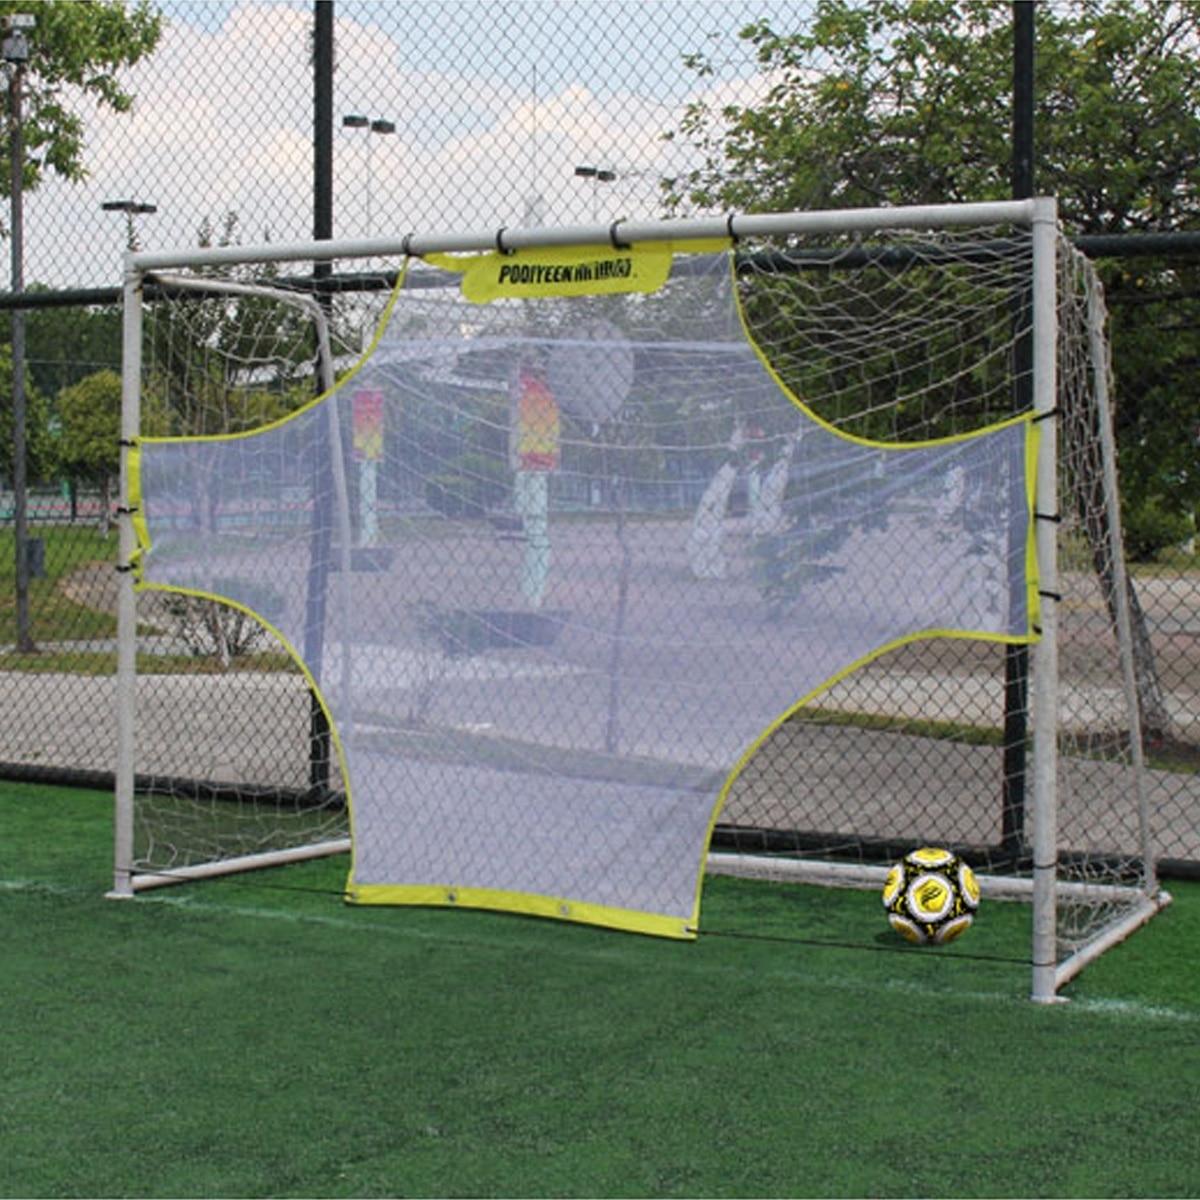 Portable Football Soccer Training Target Practice Training Shot Goal Net Soccer Ball for Children Students 5 Person System